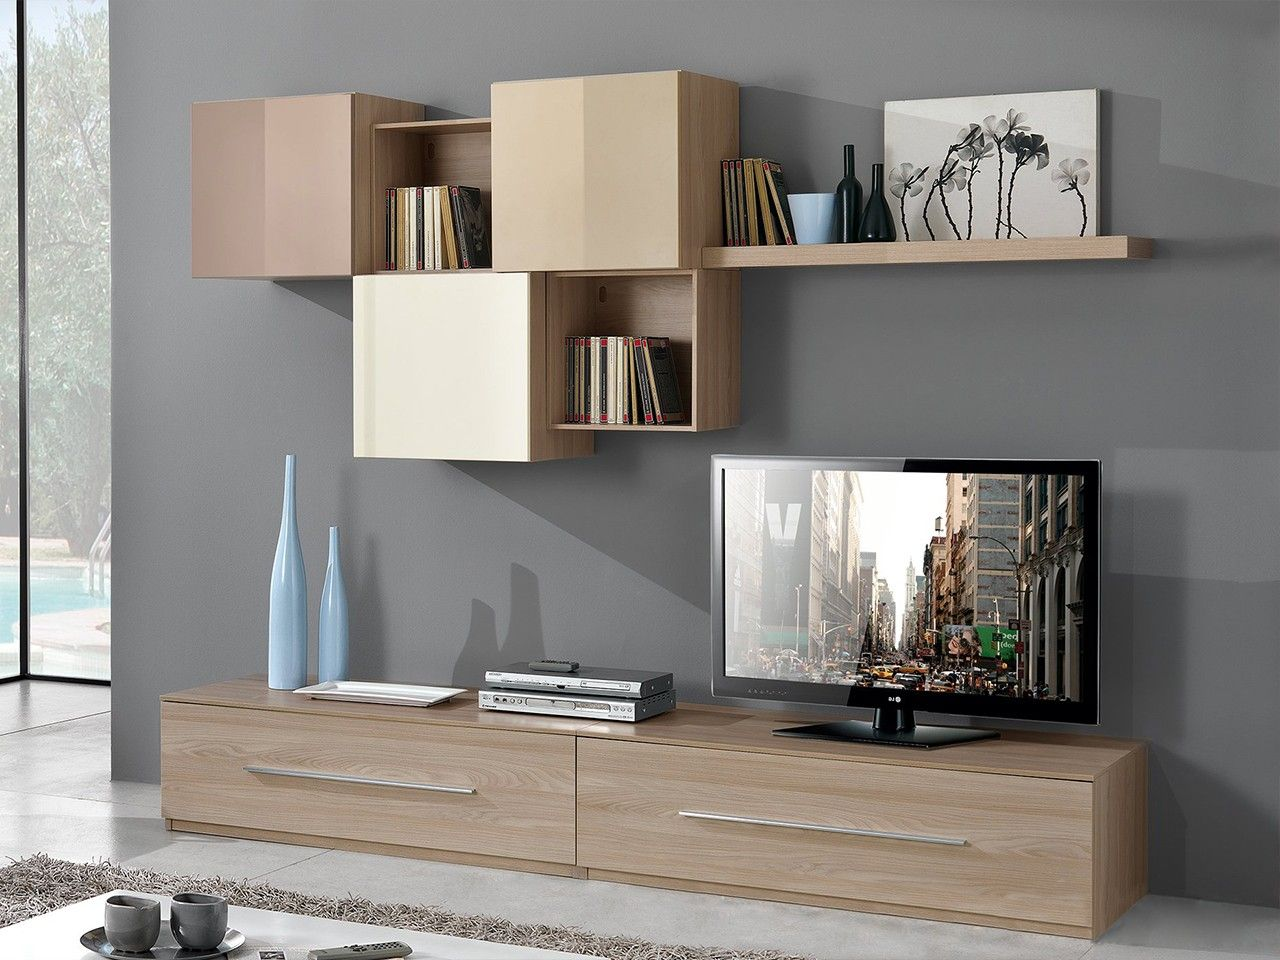 Resultado de imagen para bife mueble moderno casa for Muebles modulares modernos